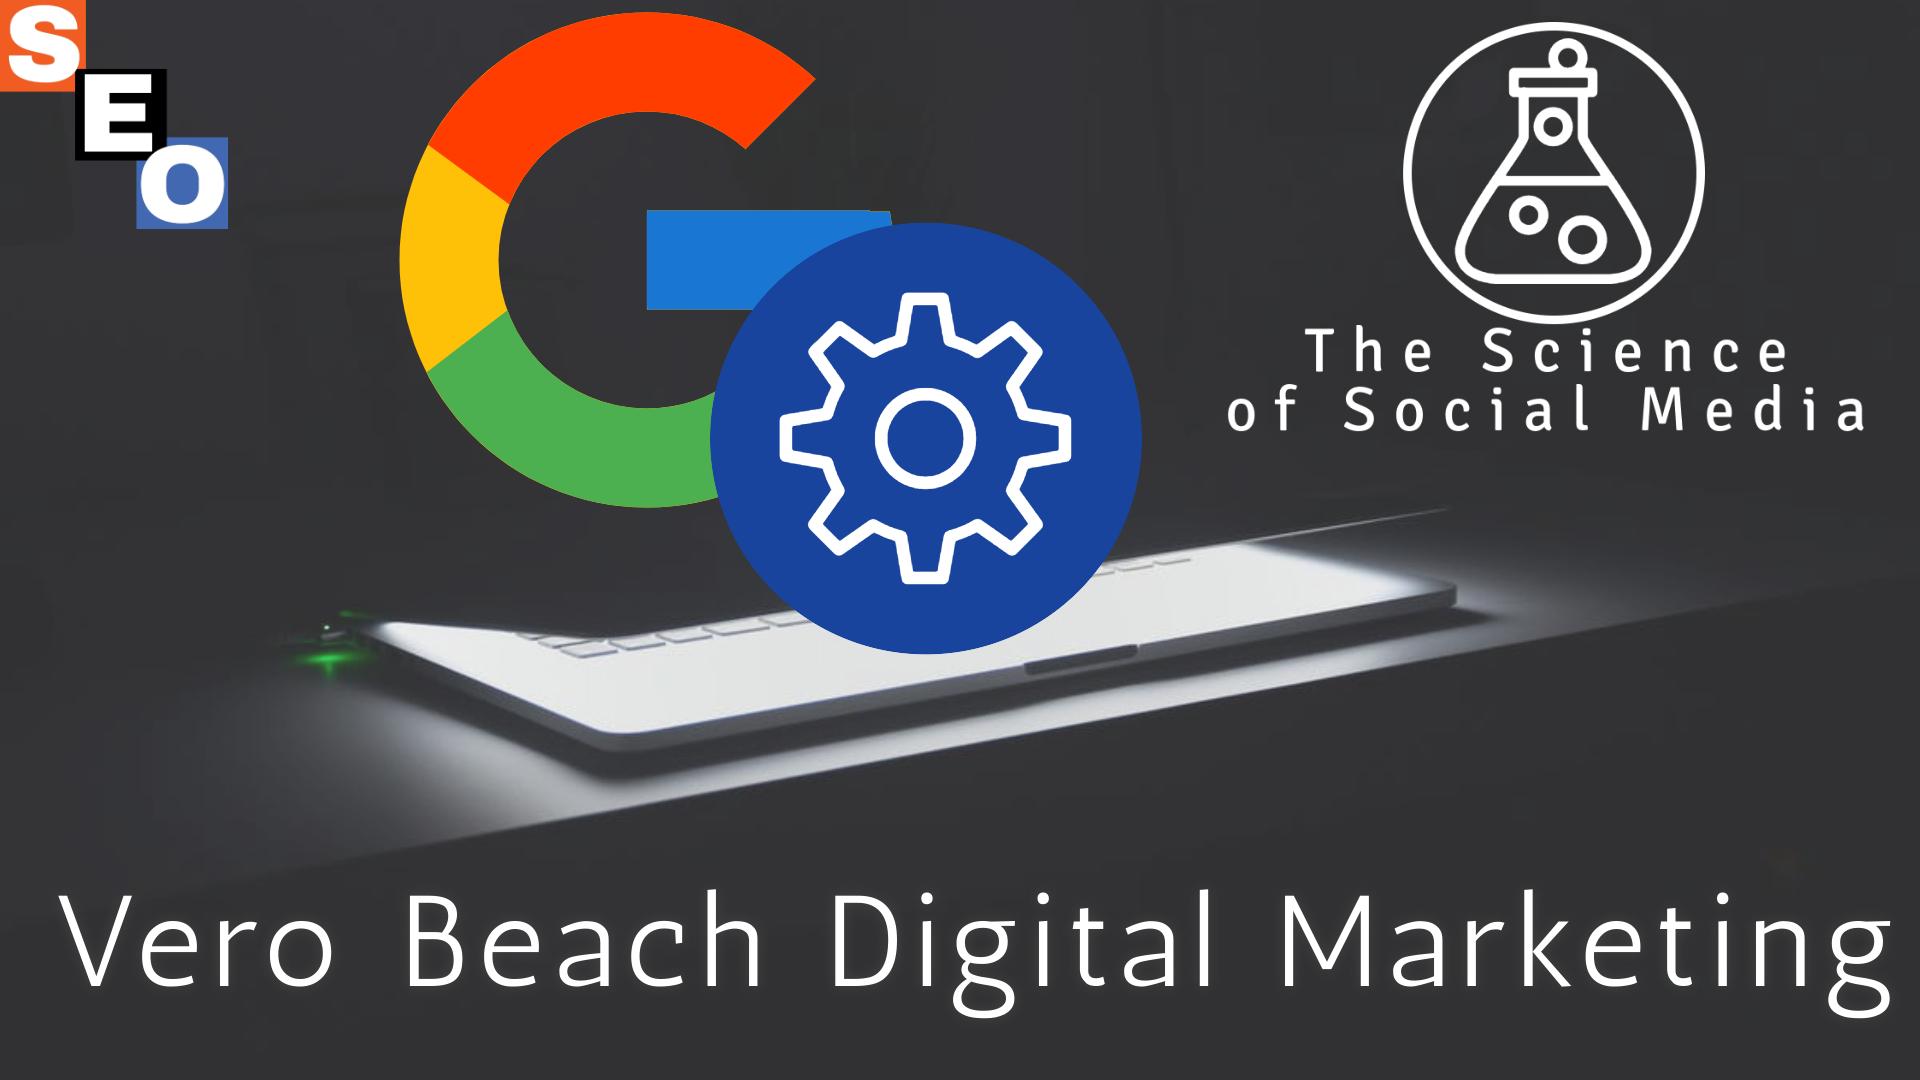 Vero Beach Digital Marketing Company